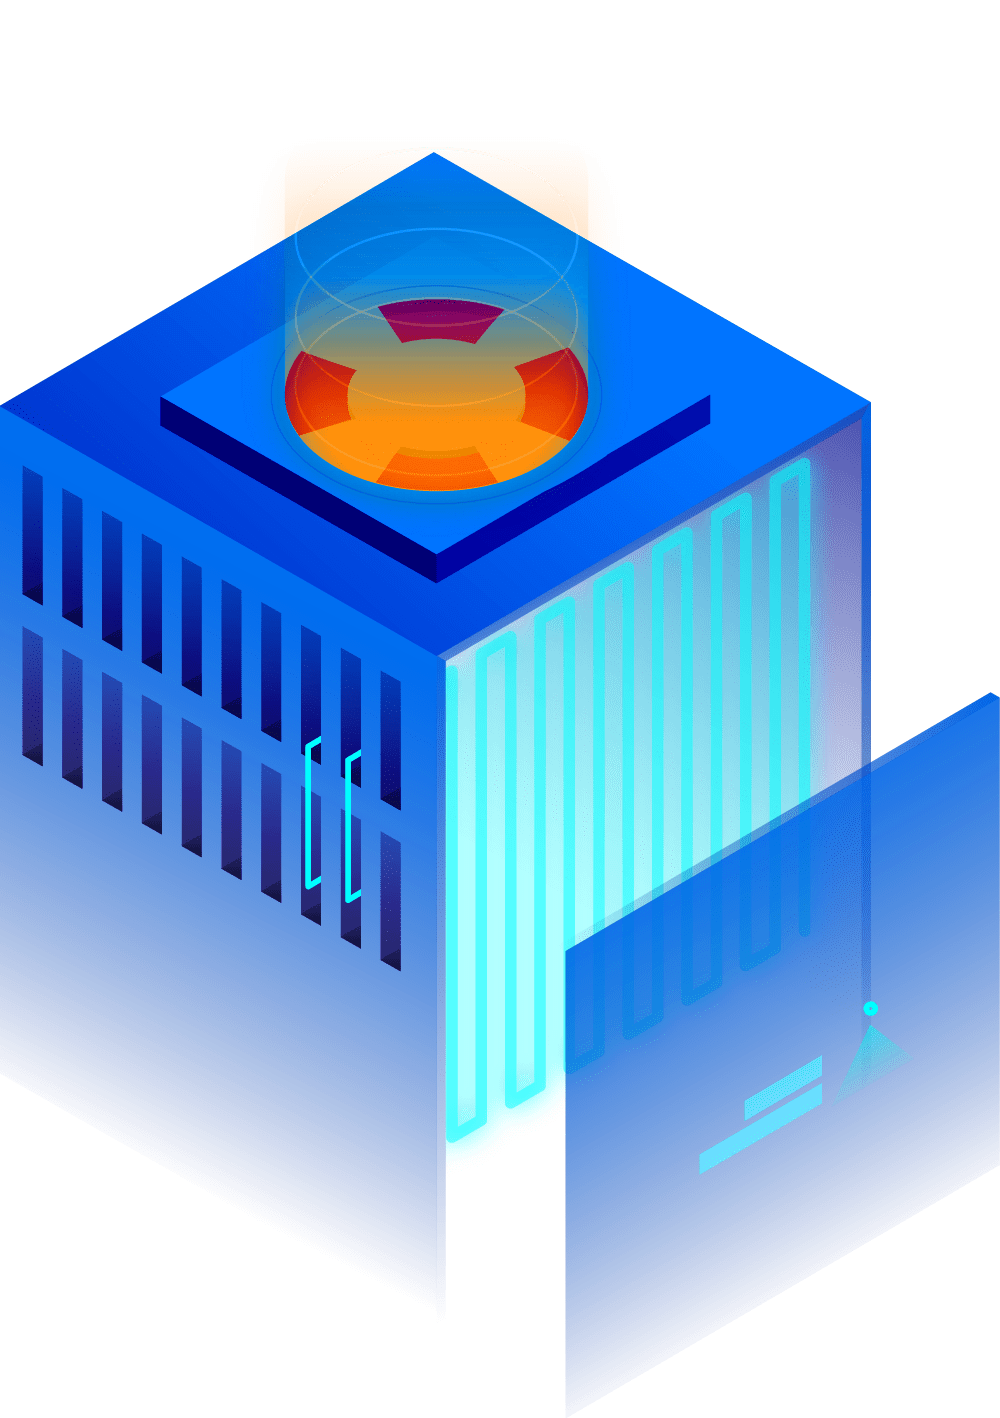 hueytown-heating-cooling-heat-pump-graphic